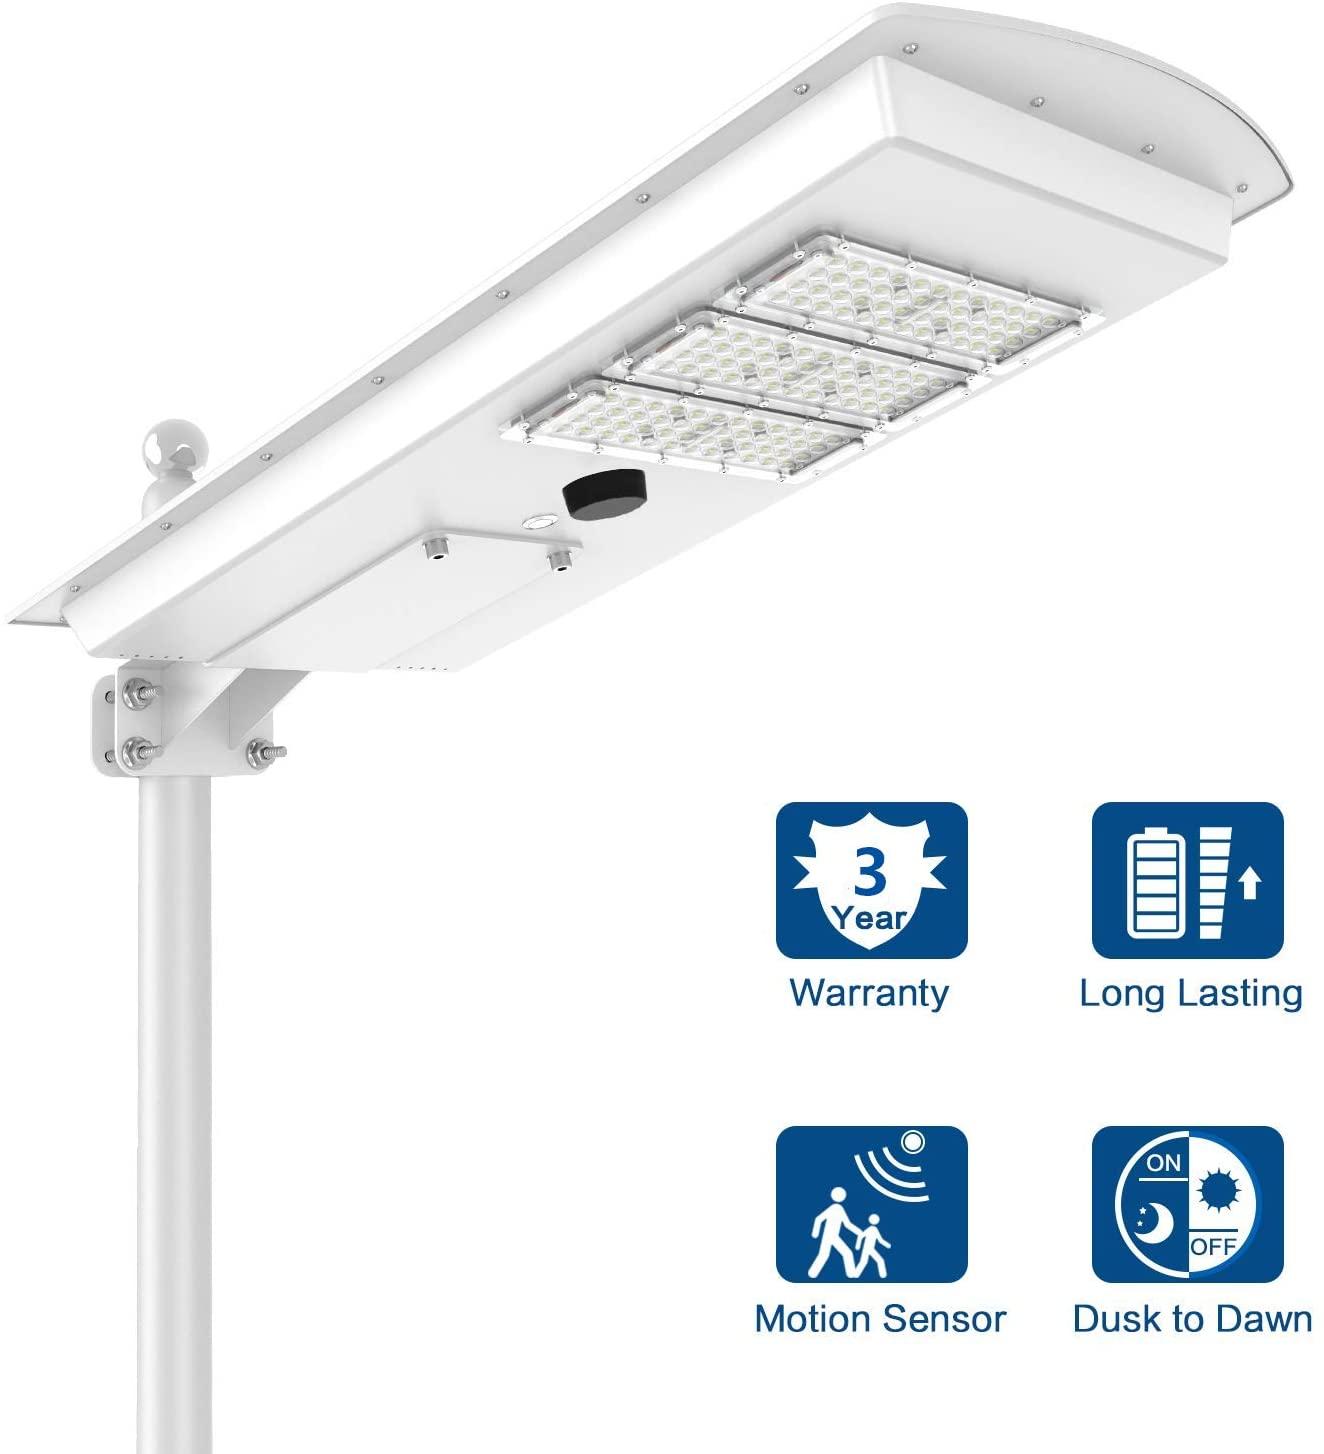 LED 50W Solar Street Light Outdoor Dusk to Dawn Motion Sensor Commercial Area Lighting Yard Garden Security Lamp Waterproof Wireless Installation